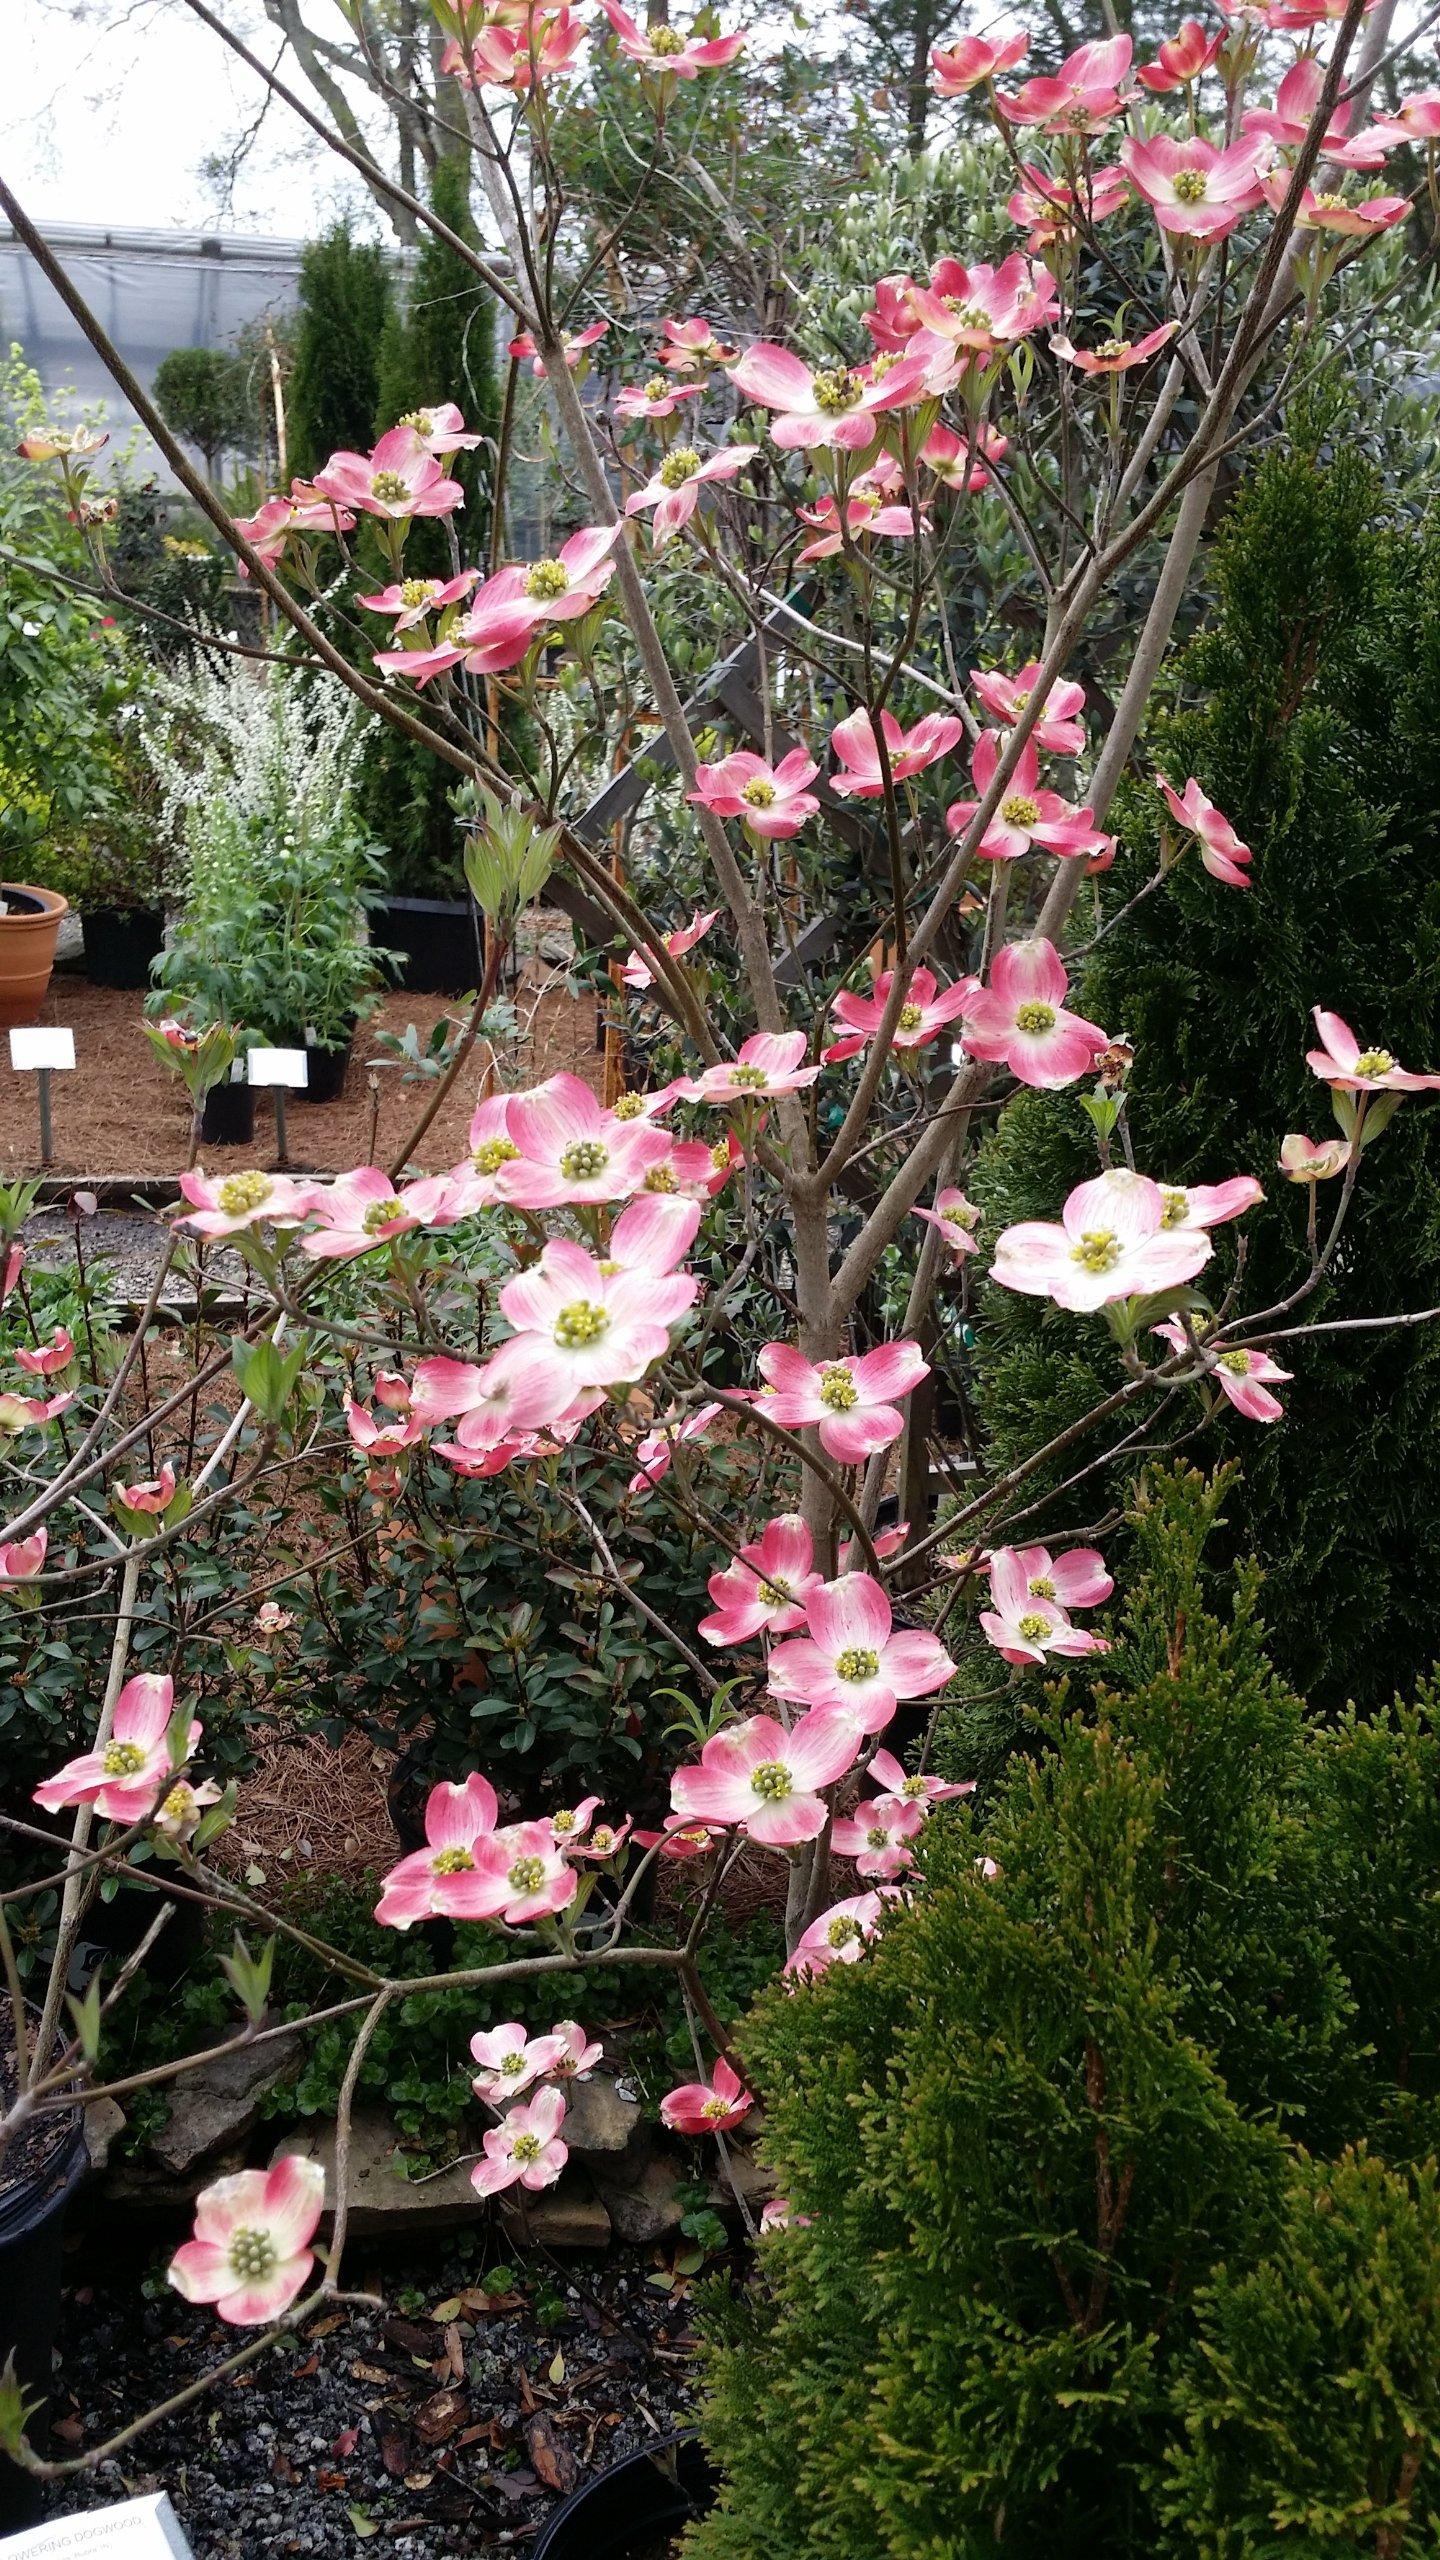 (1 gallon pot) PINK HYBRID DOGWOOD Tree, Spectacular Hybrids Are Prolific Bloomers and Highly Disease Resistant. Hybrid of Cornus florida x Cornus kousa, (AKA STELLAR PINK) Dogwood SOFT PINK Flowers